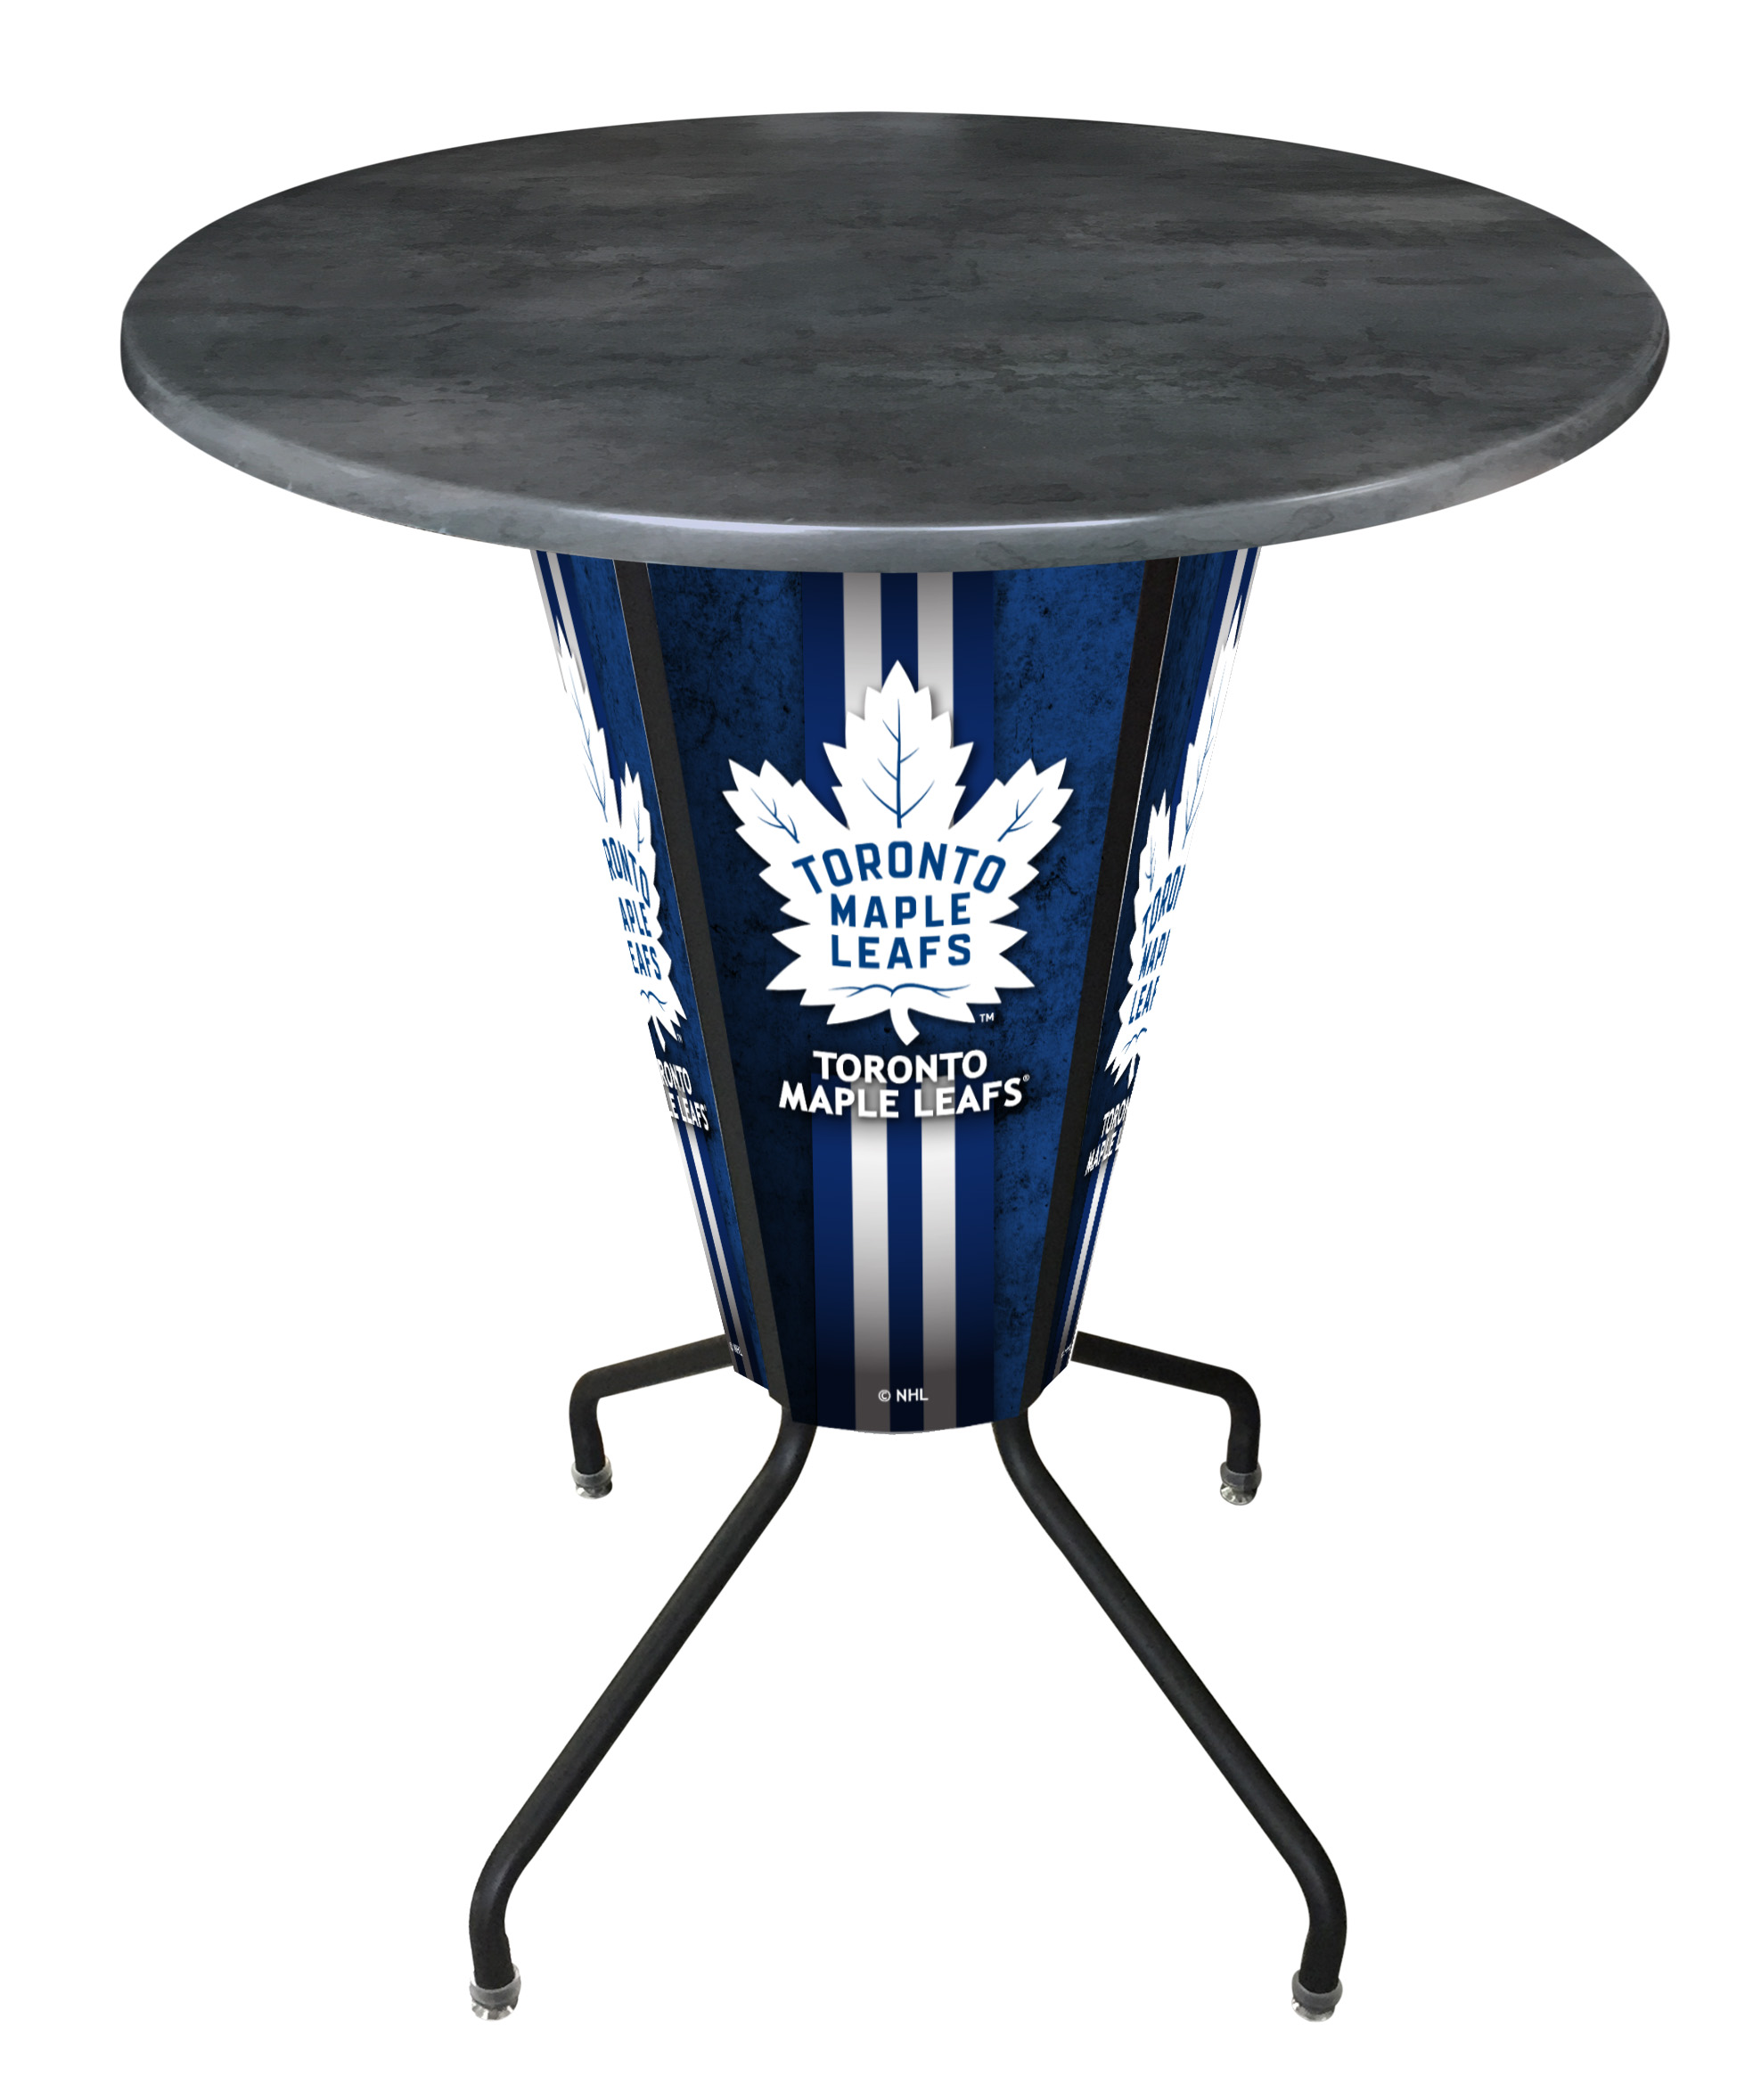 Holland Bar Stool L218B42TorMplOD36RBlk Lighted Toronto Maple Leafs Pub Table